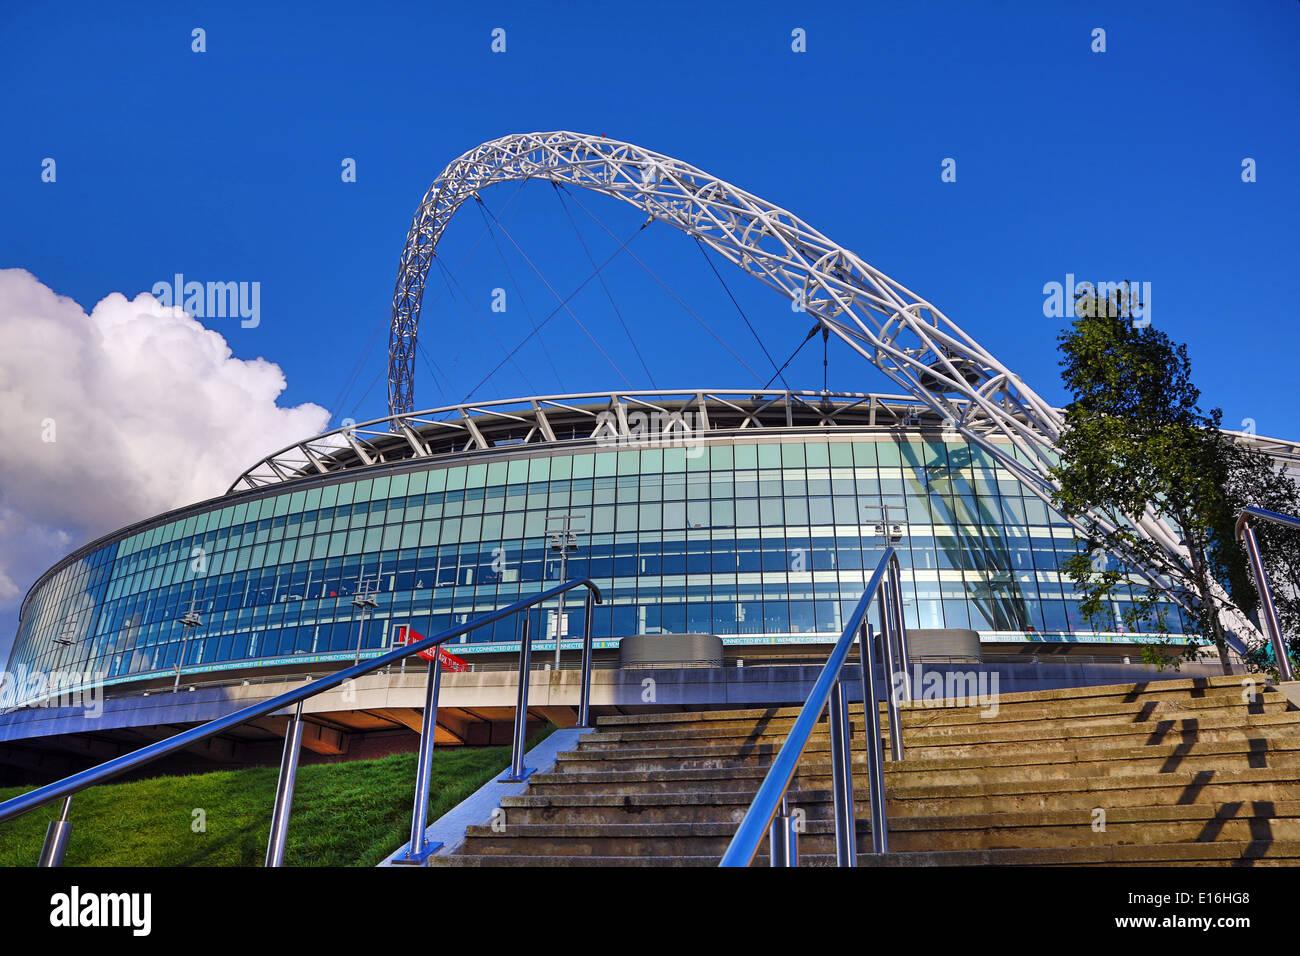 The Lattice Arch of Wembley Stadium, London, England - Stock Image